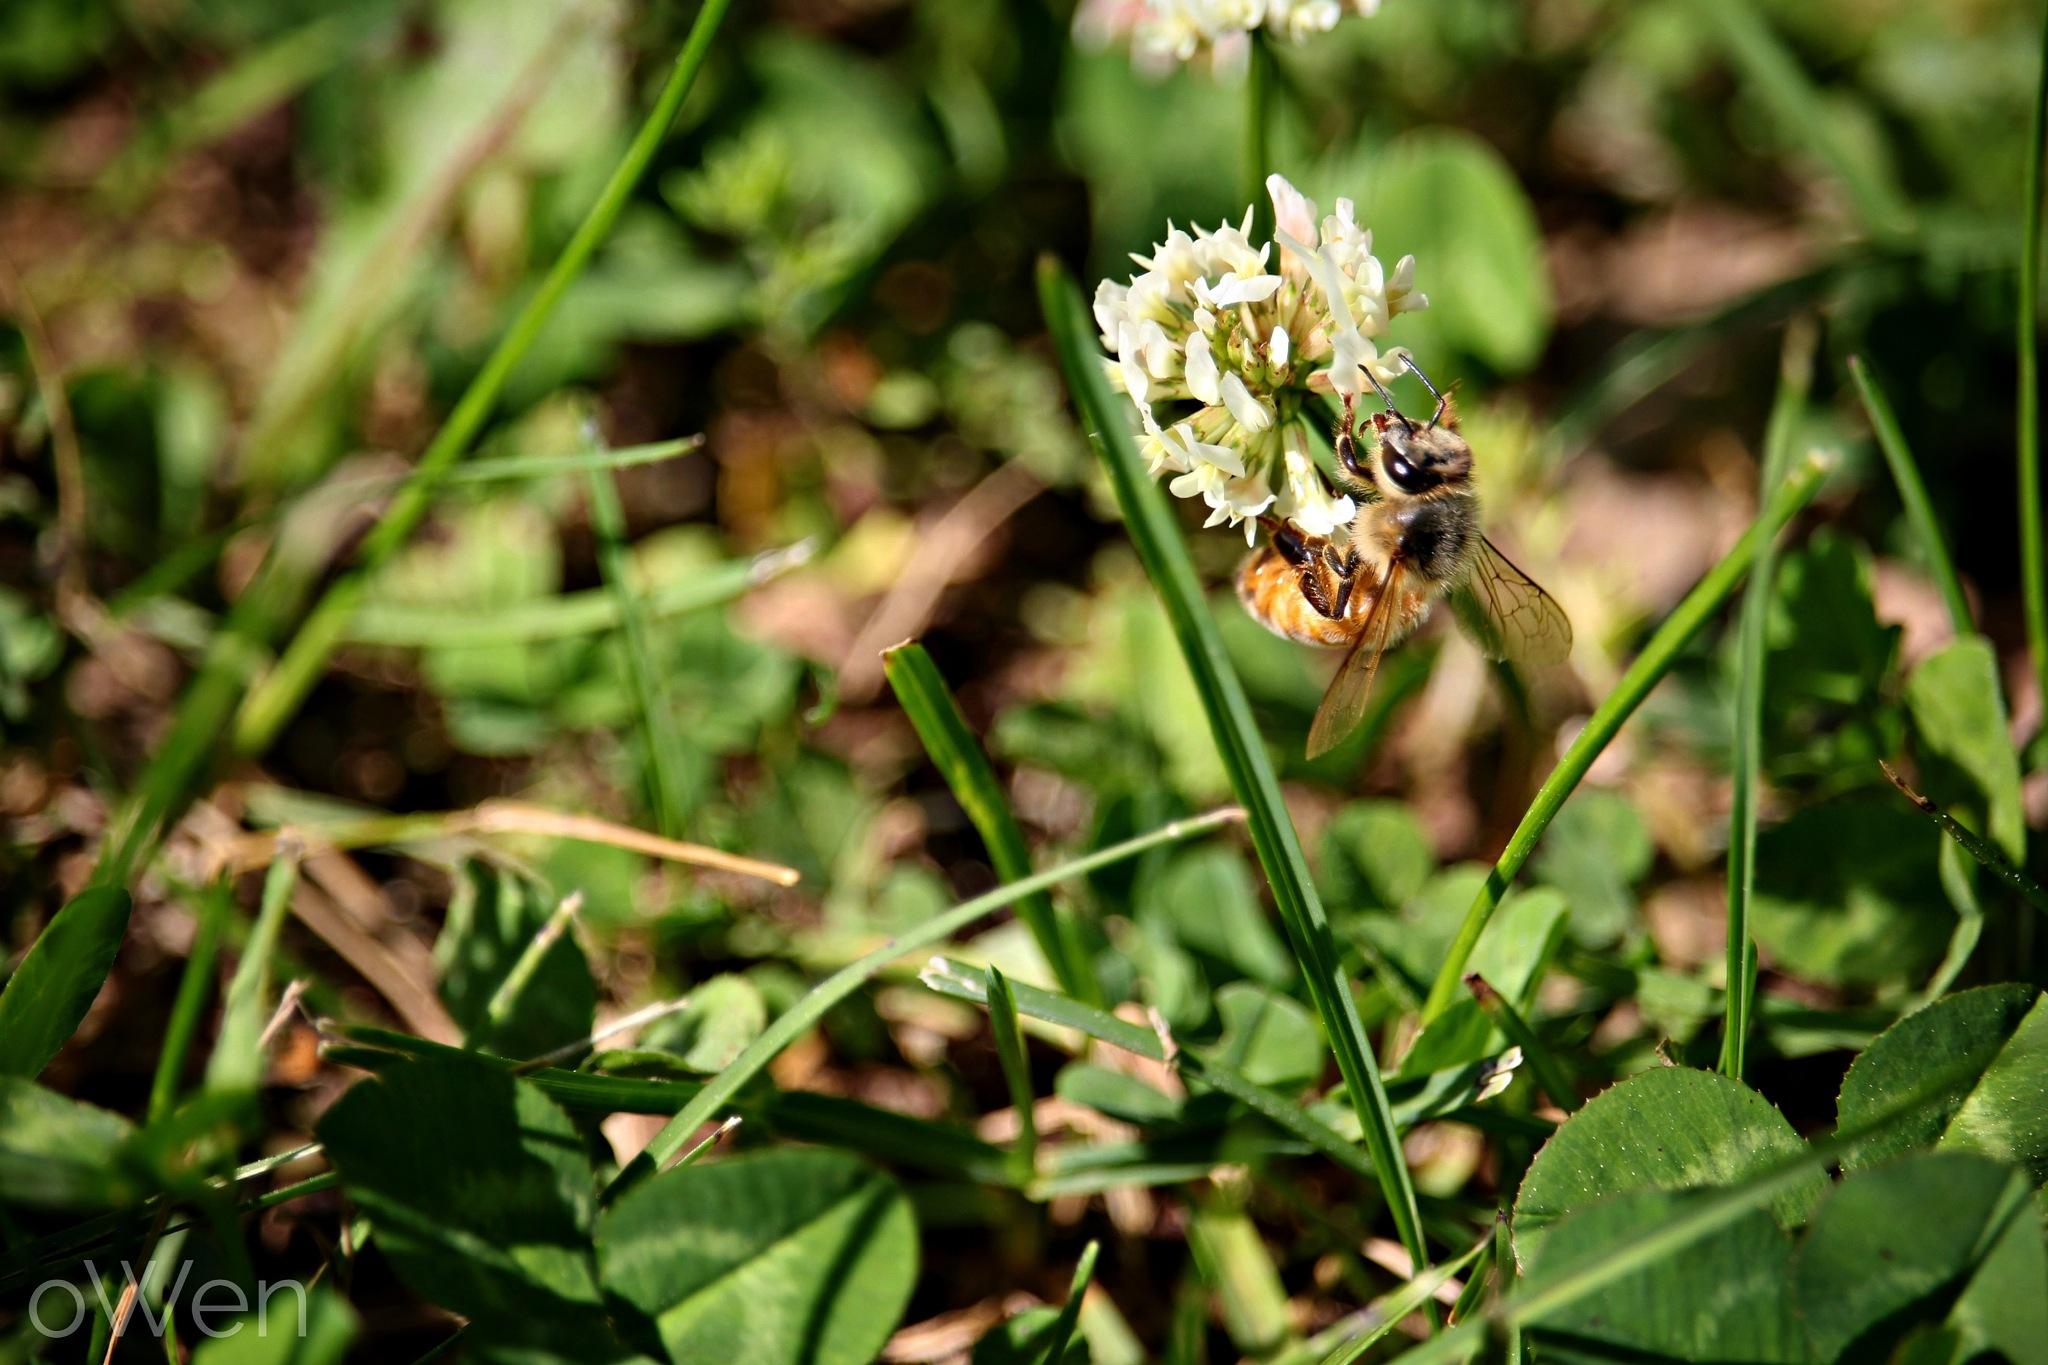 The Pollinator by Blane Owen